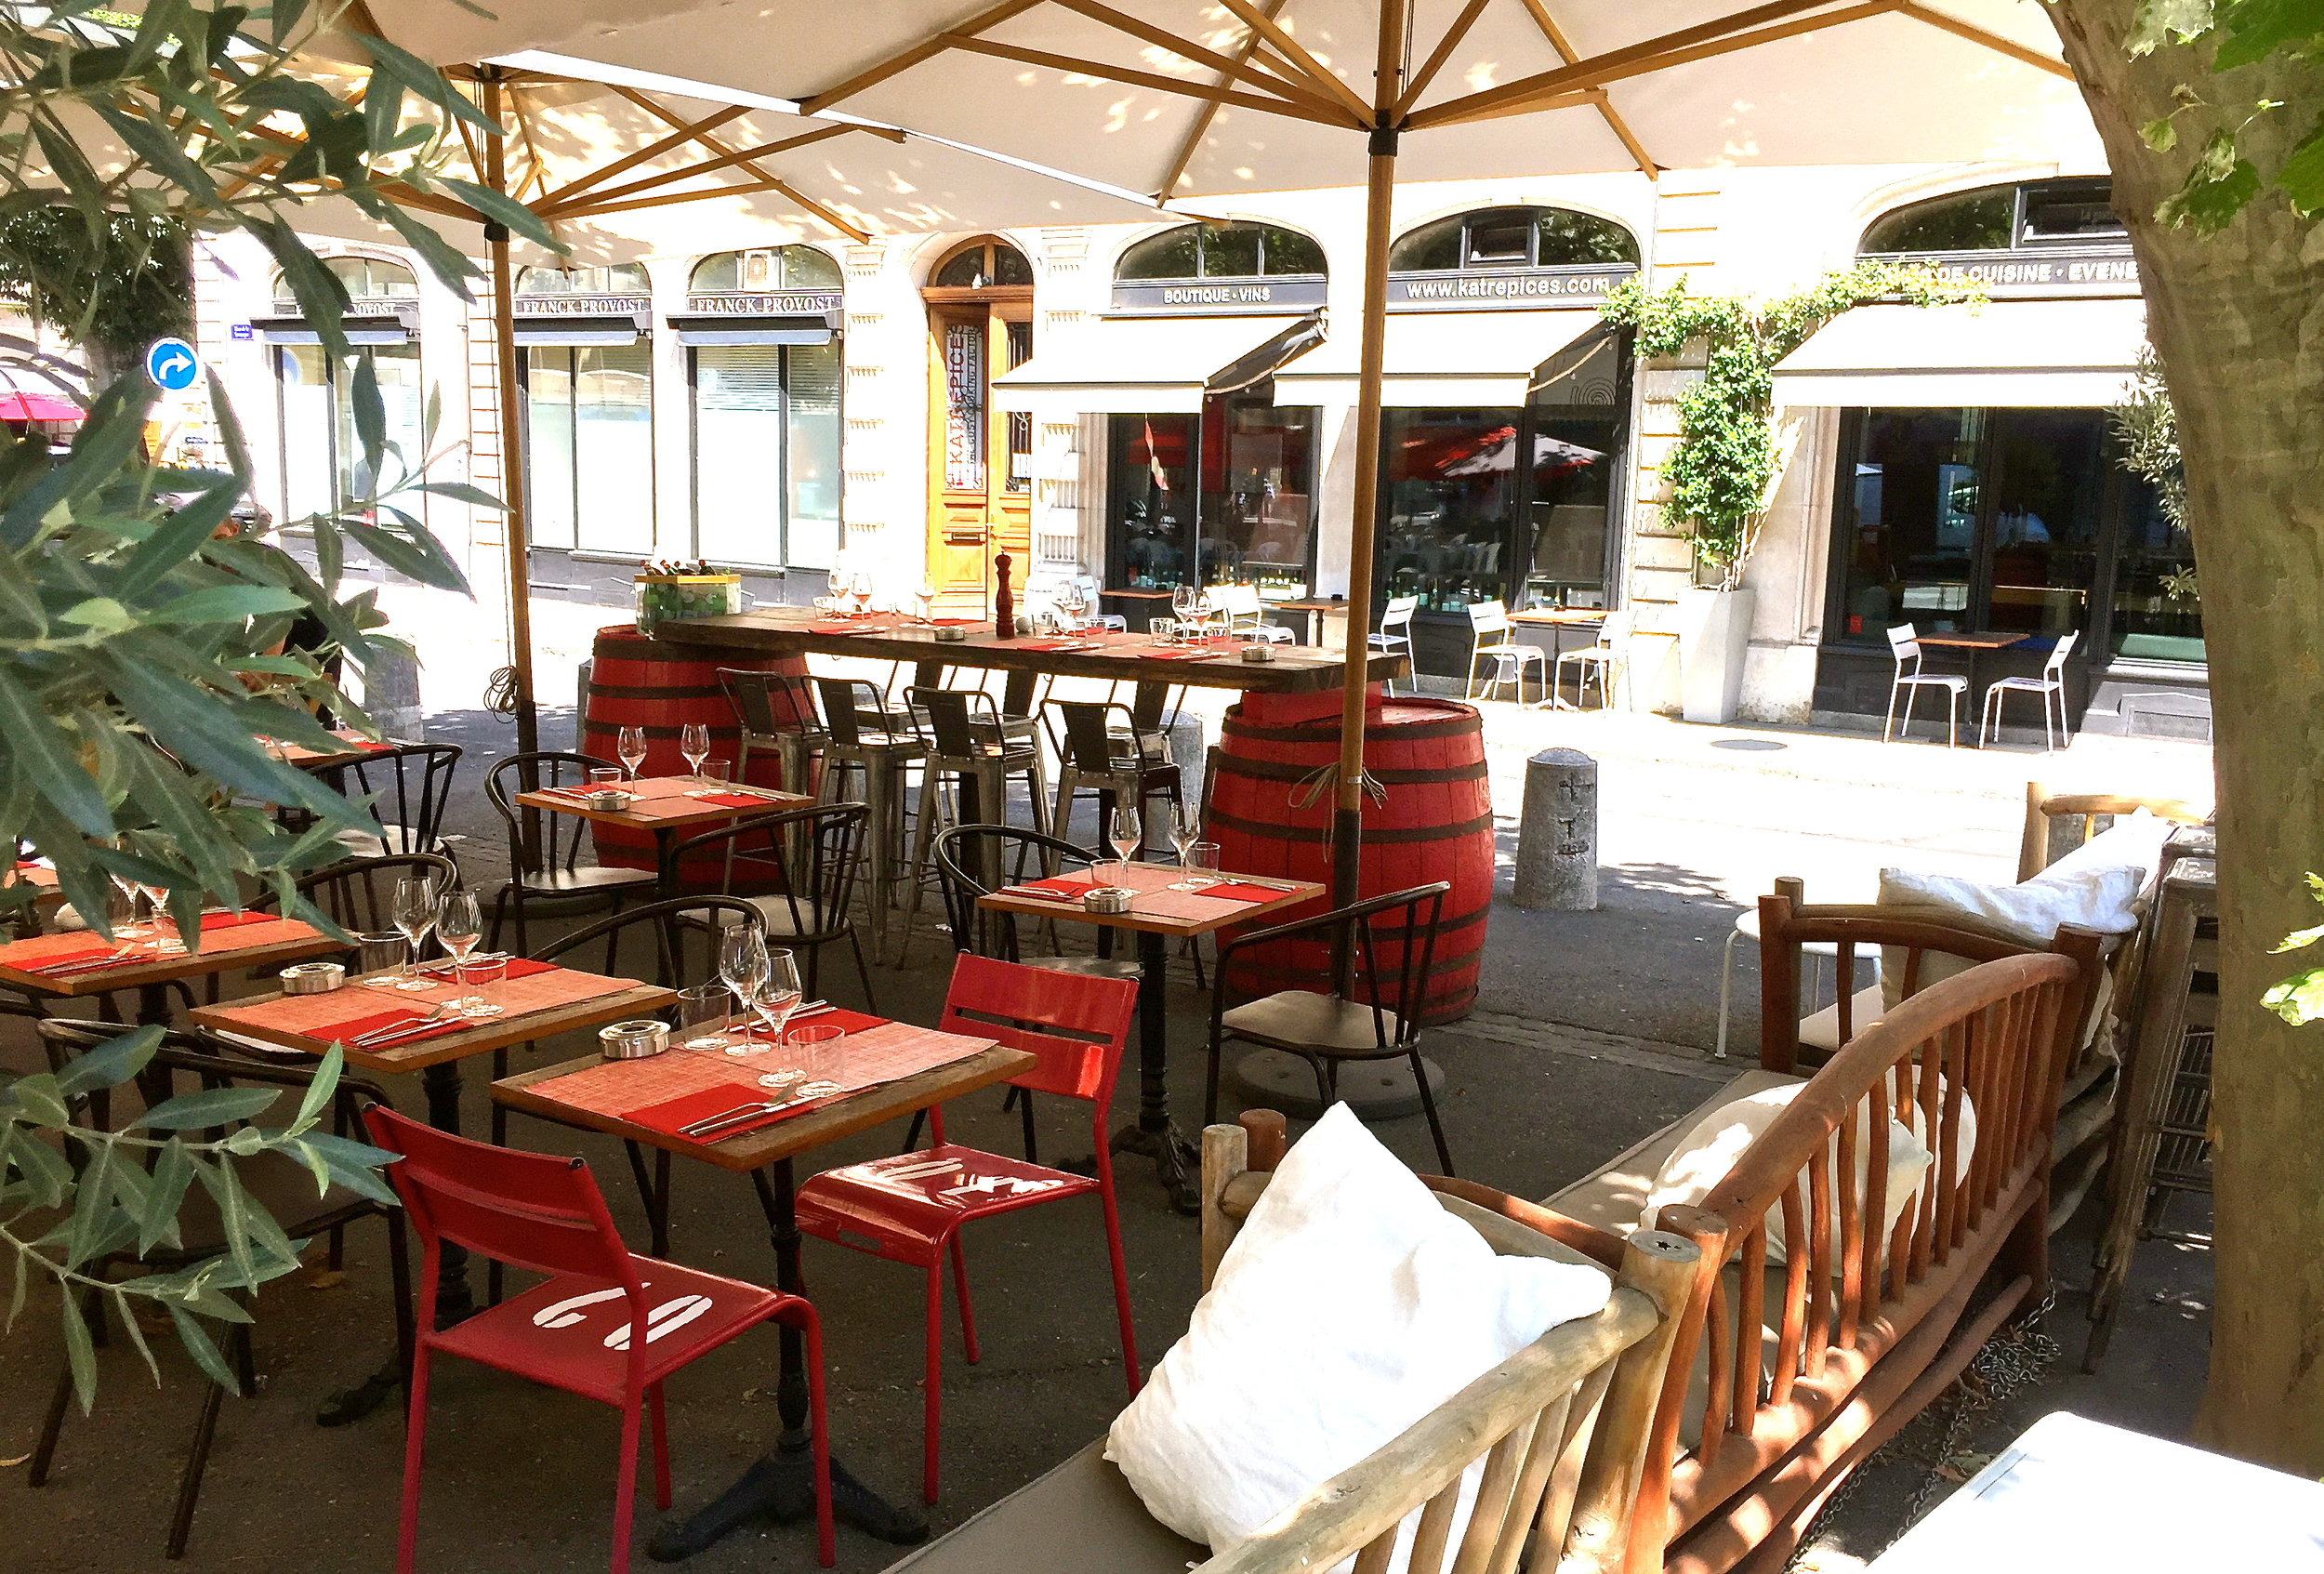 katrepices-restaurant-geneve-platdujou-coursdecuisine-baravin10.JPG